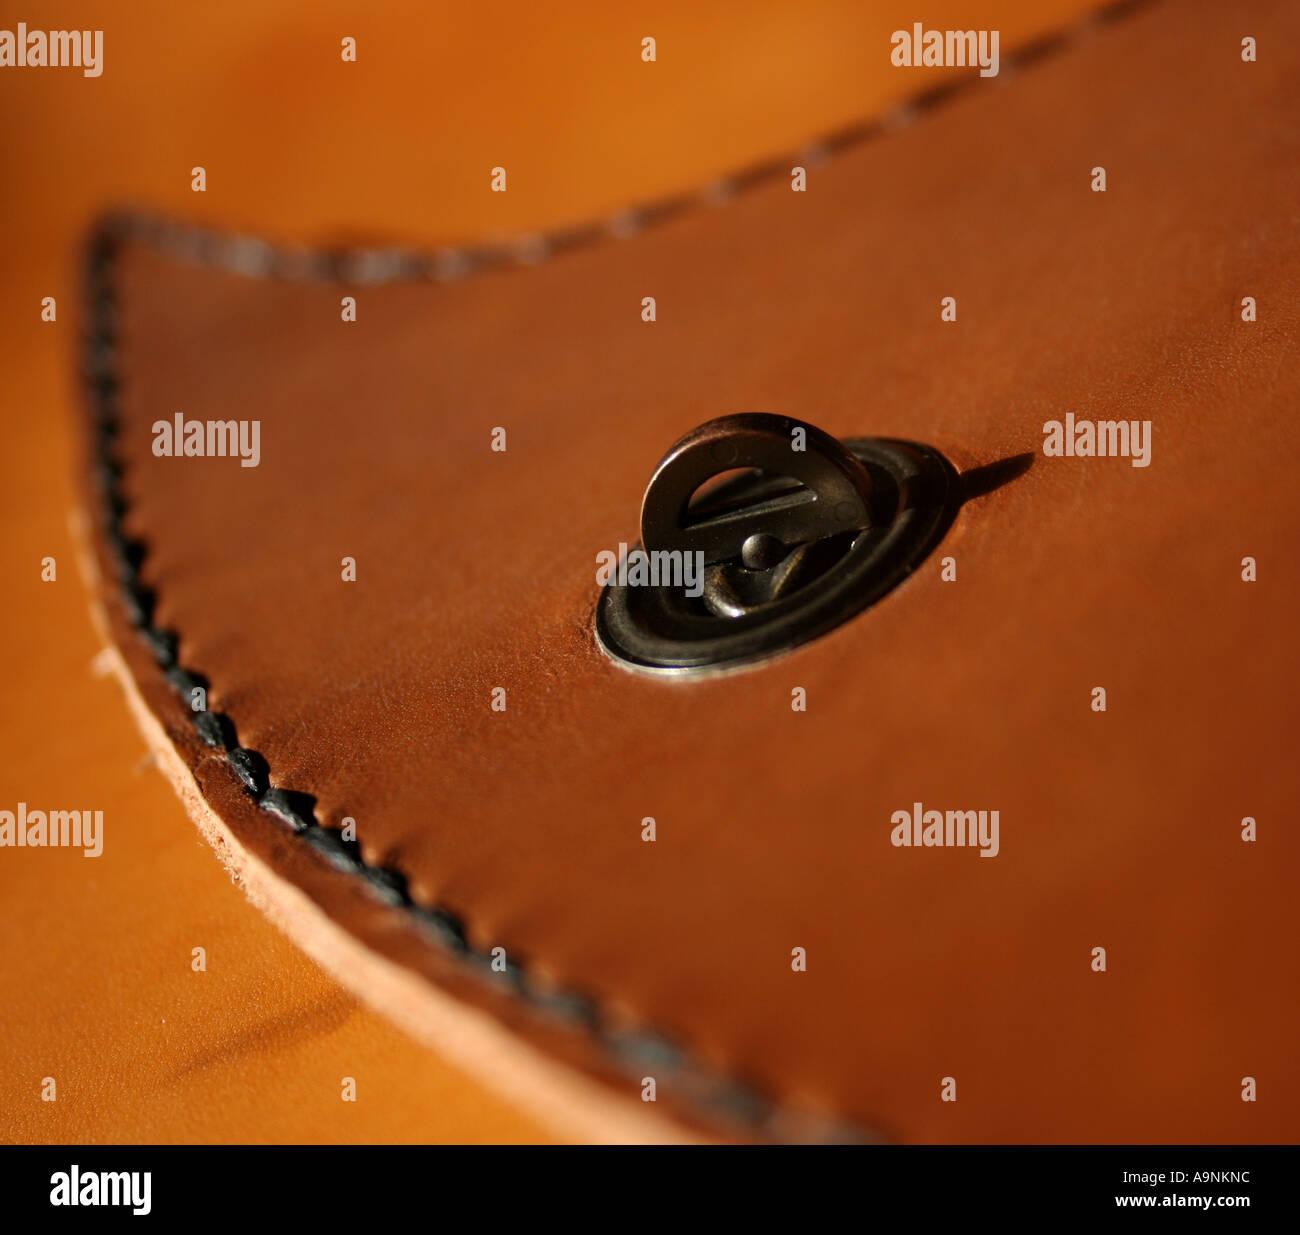 a8b63bb24 Crafted Handbag Imágenes De Stock & Crafted Handbag Fotos De Stock ...